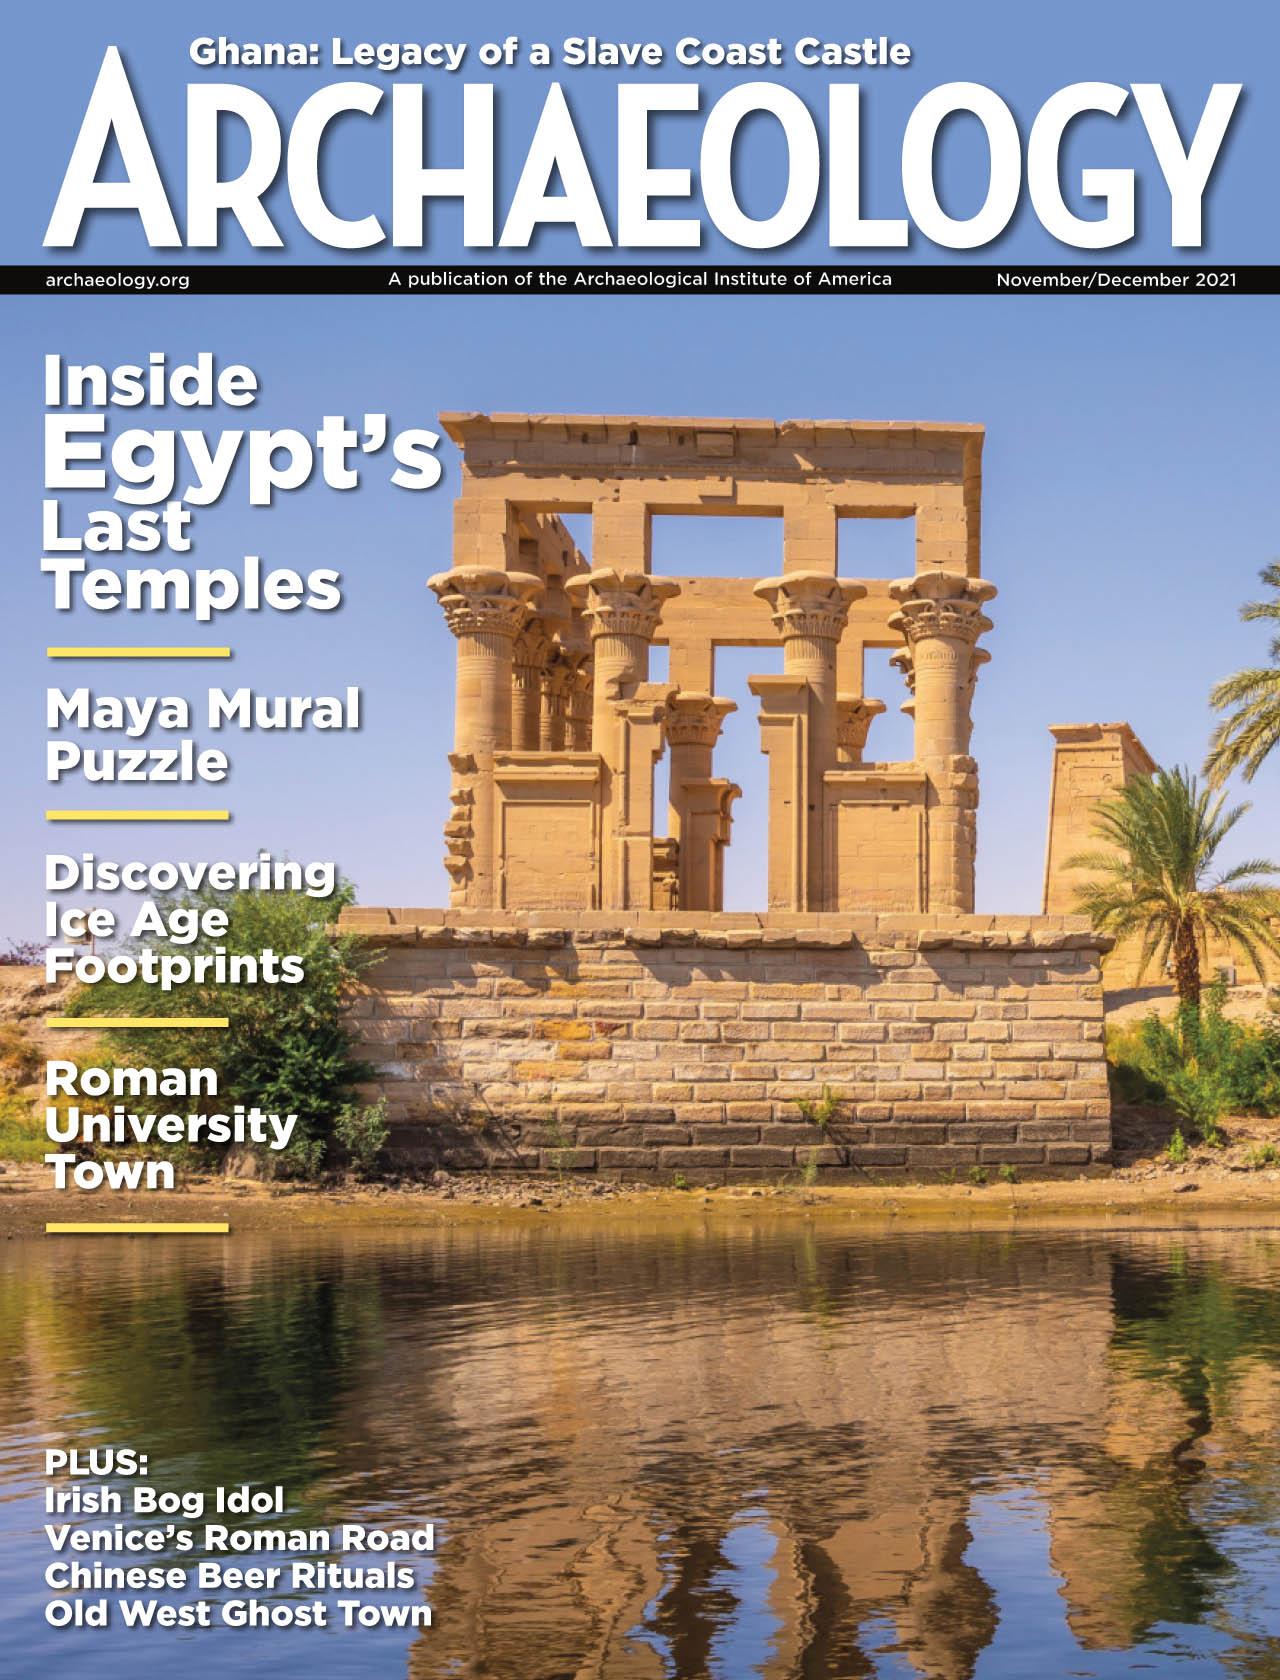 Archaeology 2021-11-12 Egypt 01.jpg